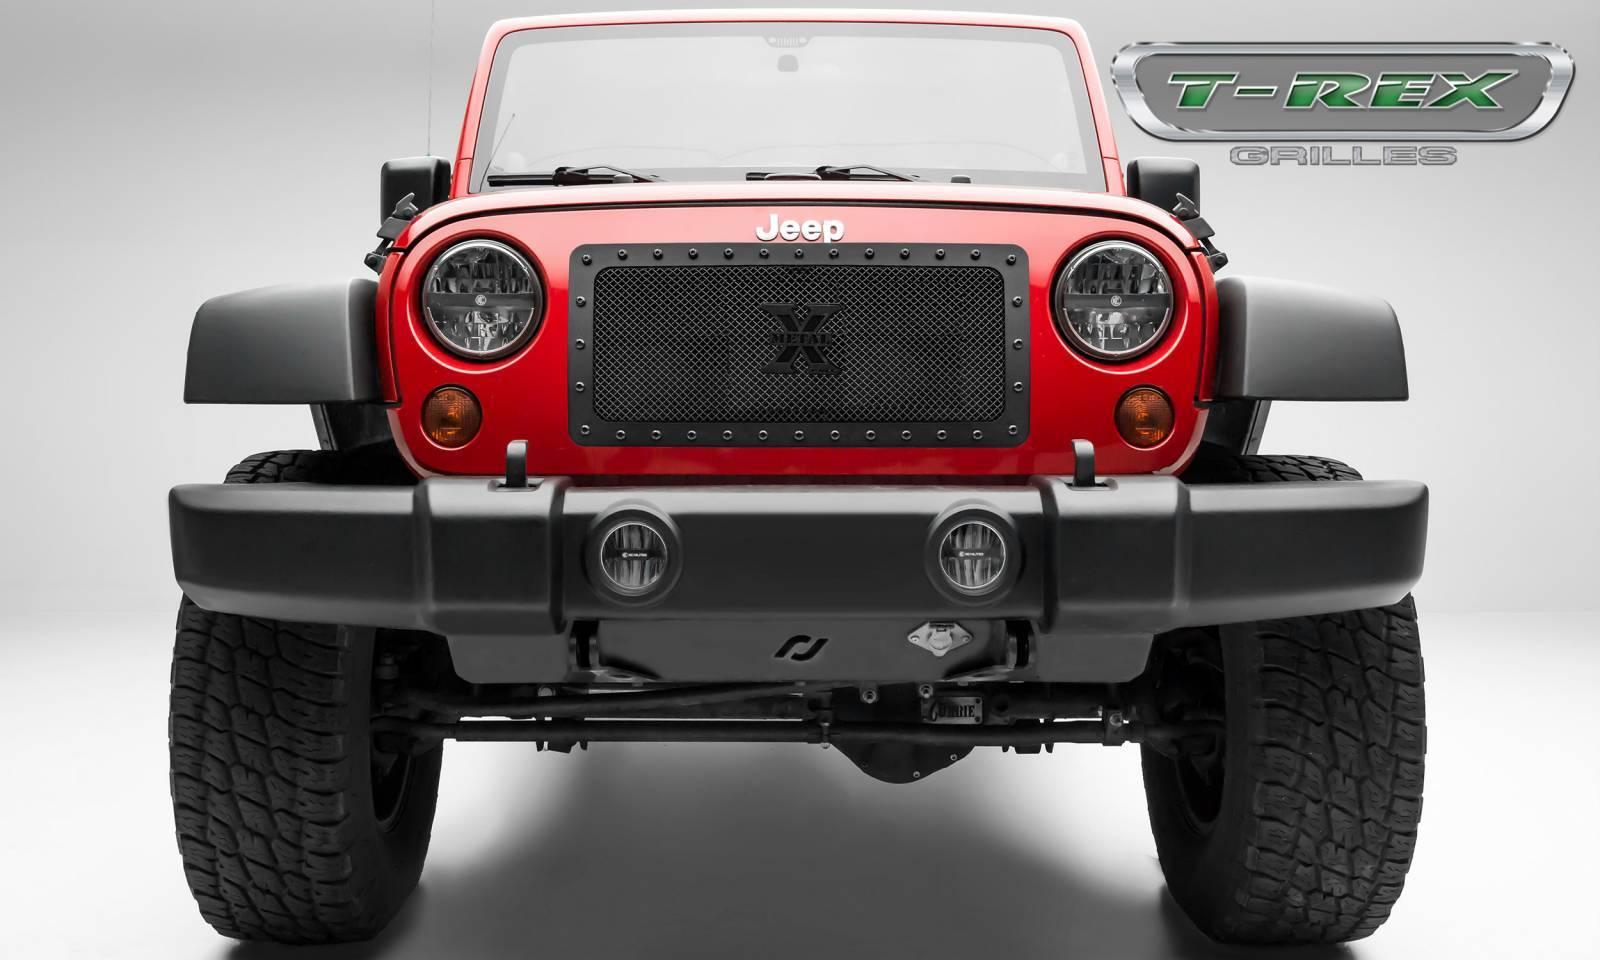 Jeep Wrangler X-METAL Series - Tactical Balck Studded Main Grille - ALL Black - 1 Pc Custom Cut Center Bars - Pt # 6714831-BR